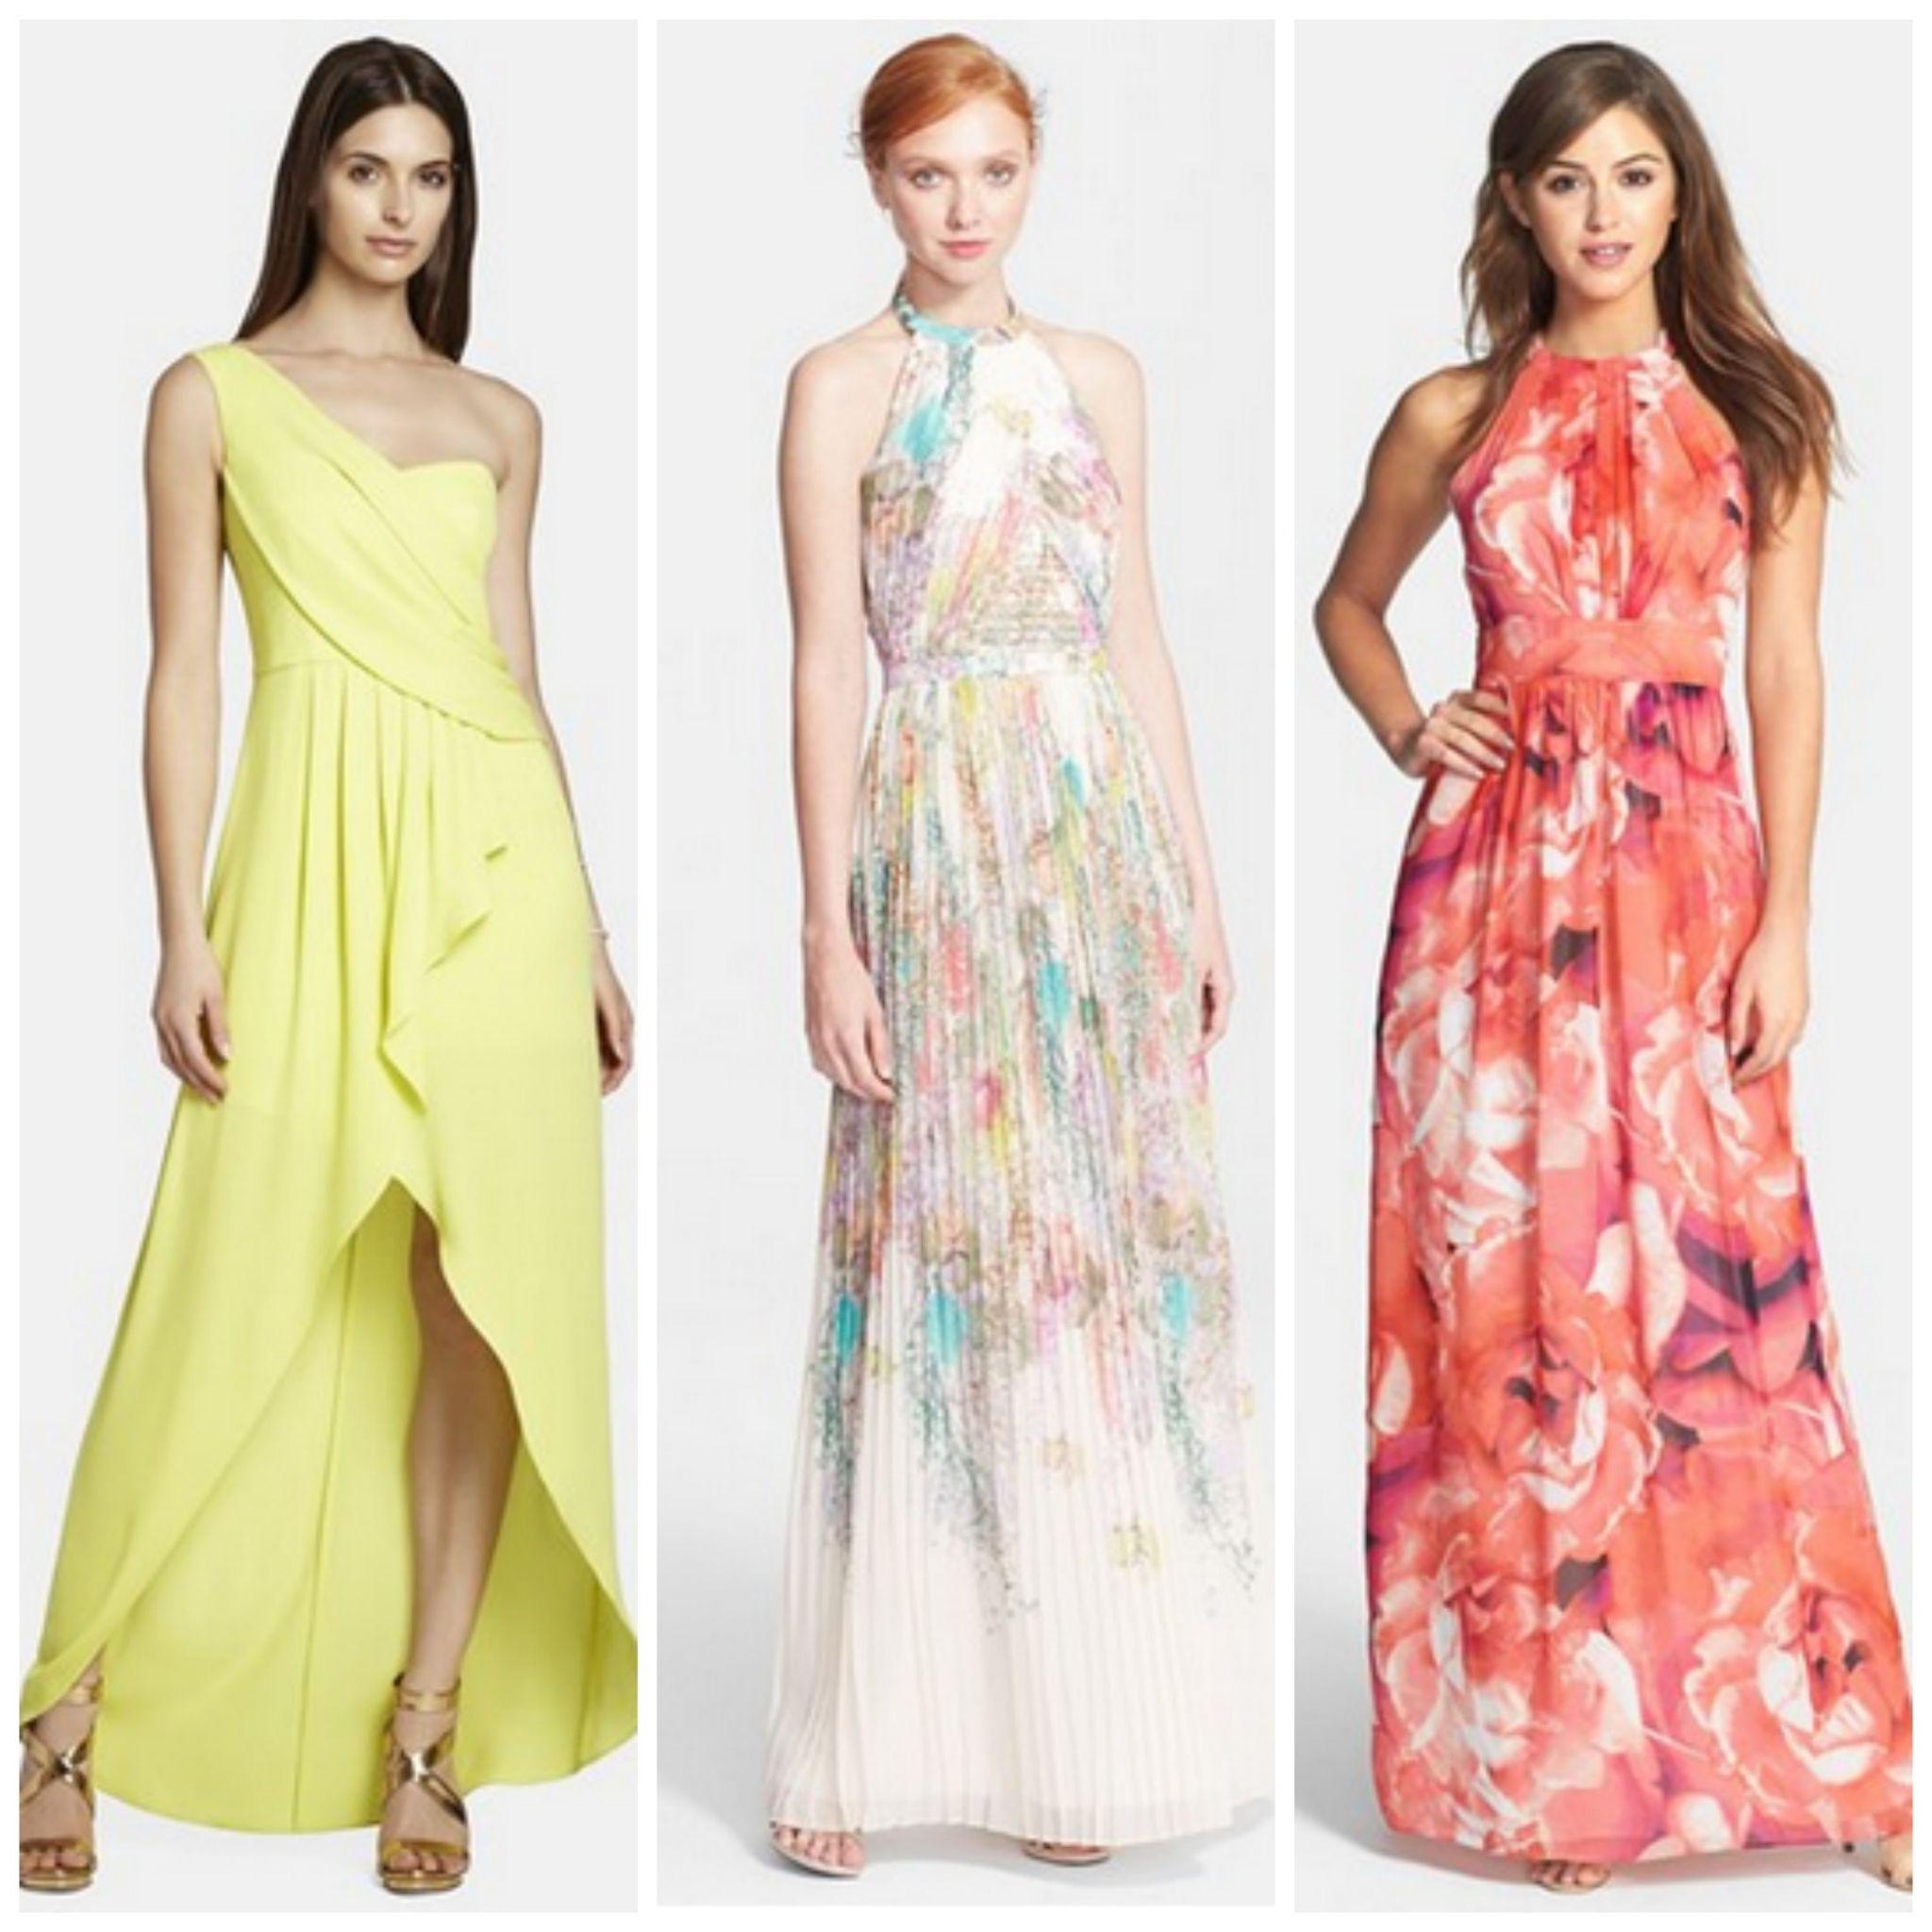 Dress for summer wedding best wedding dress for pear shaped